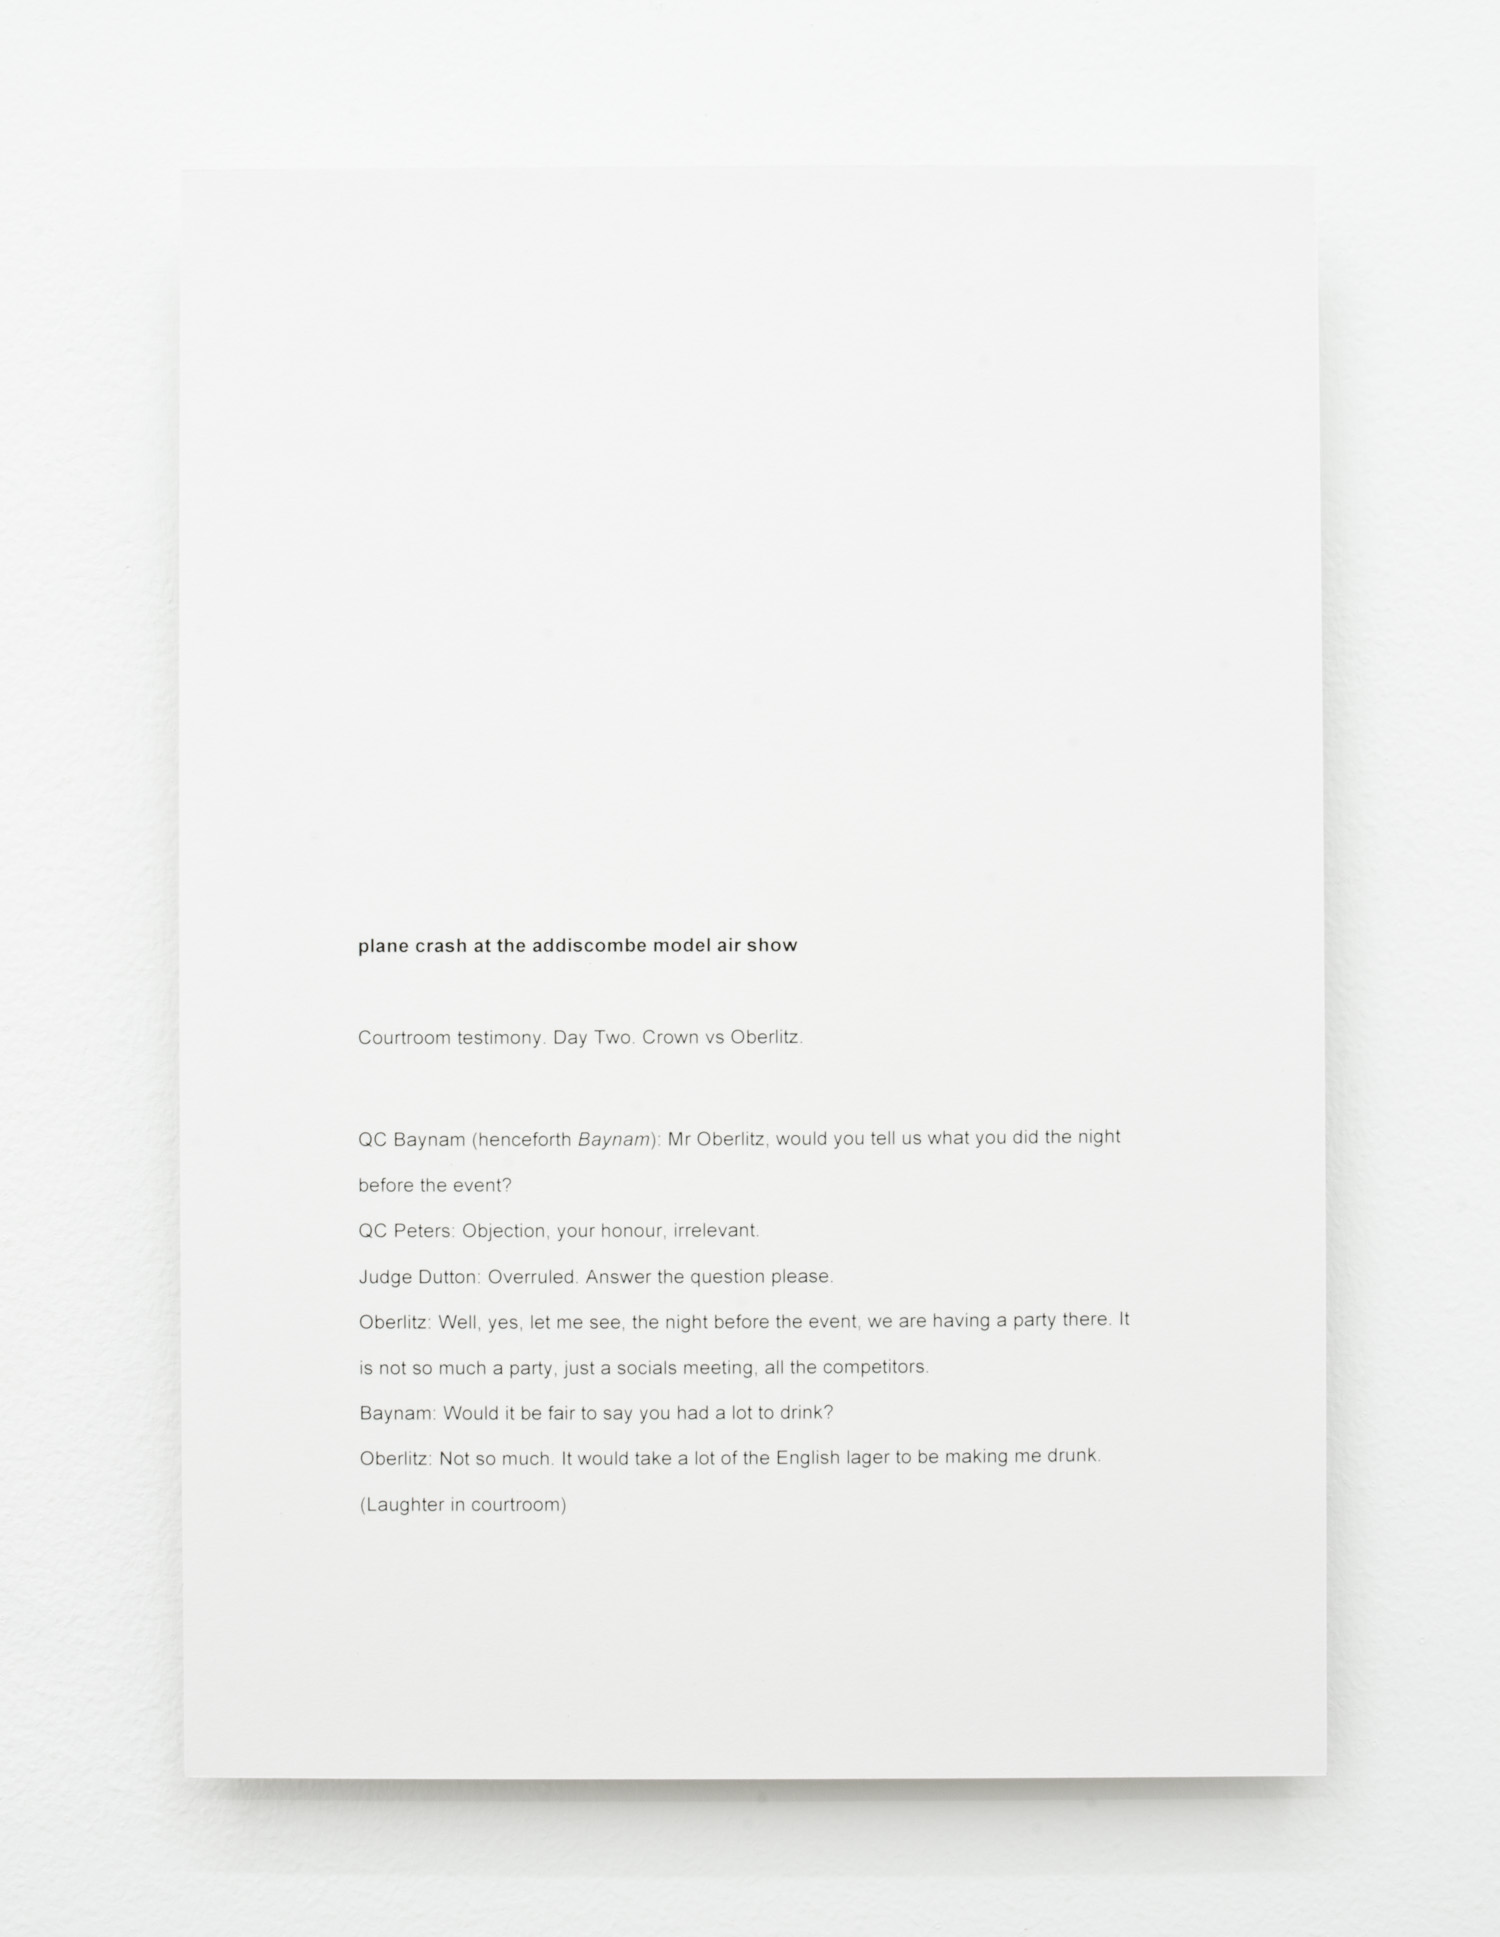 David L. Hayles, plane crash at the addiscombe model air show , 2014, laser print mounted on aluminium, 29.7 x 21cm.